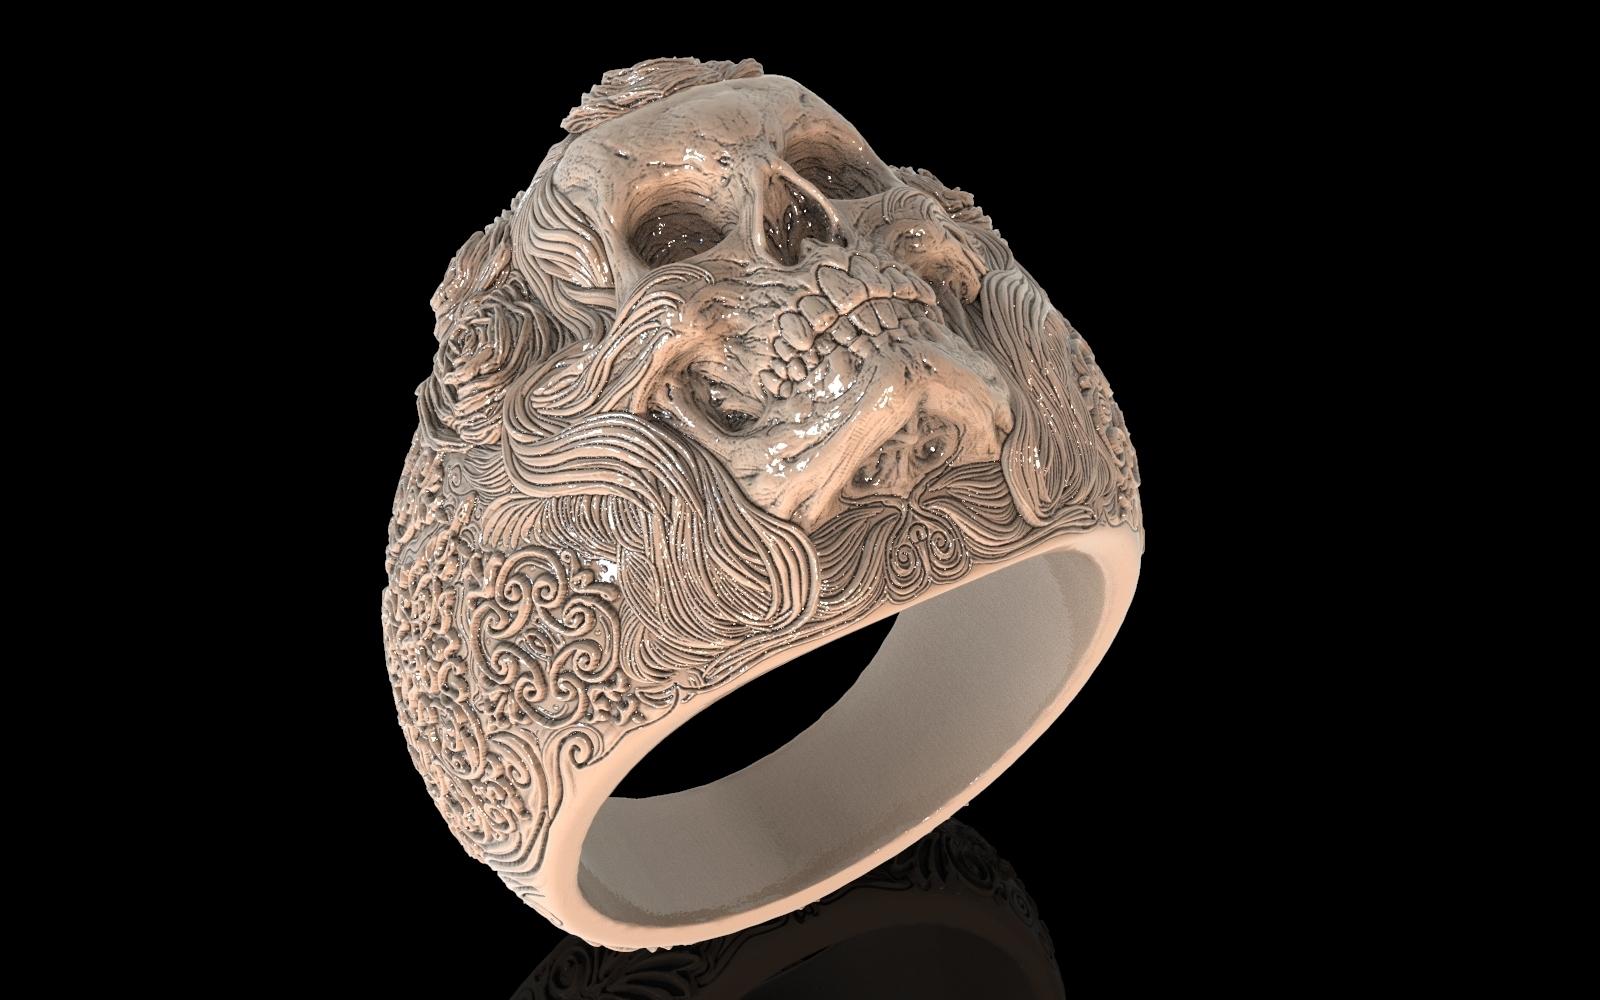 1.jpg Download free STL file Skull ring jewelry skeleton ring 3D print model • 3D print object, Cadagency